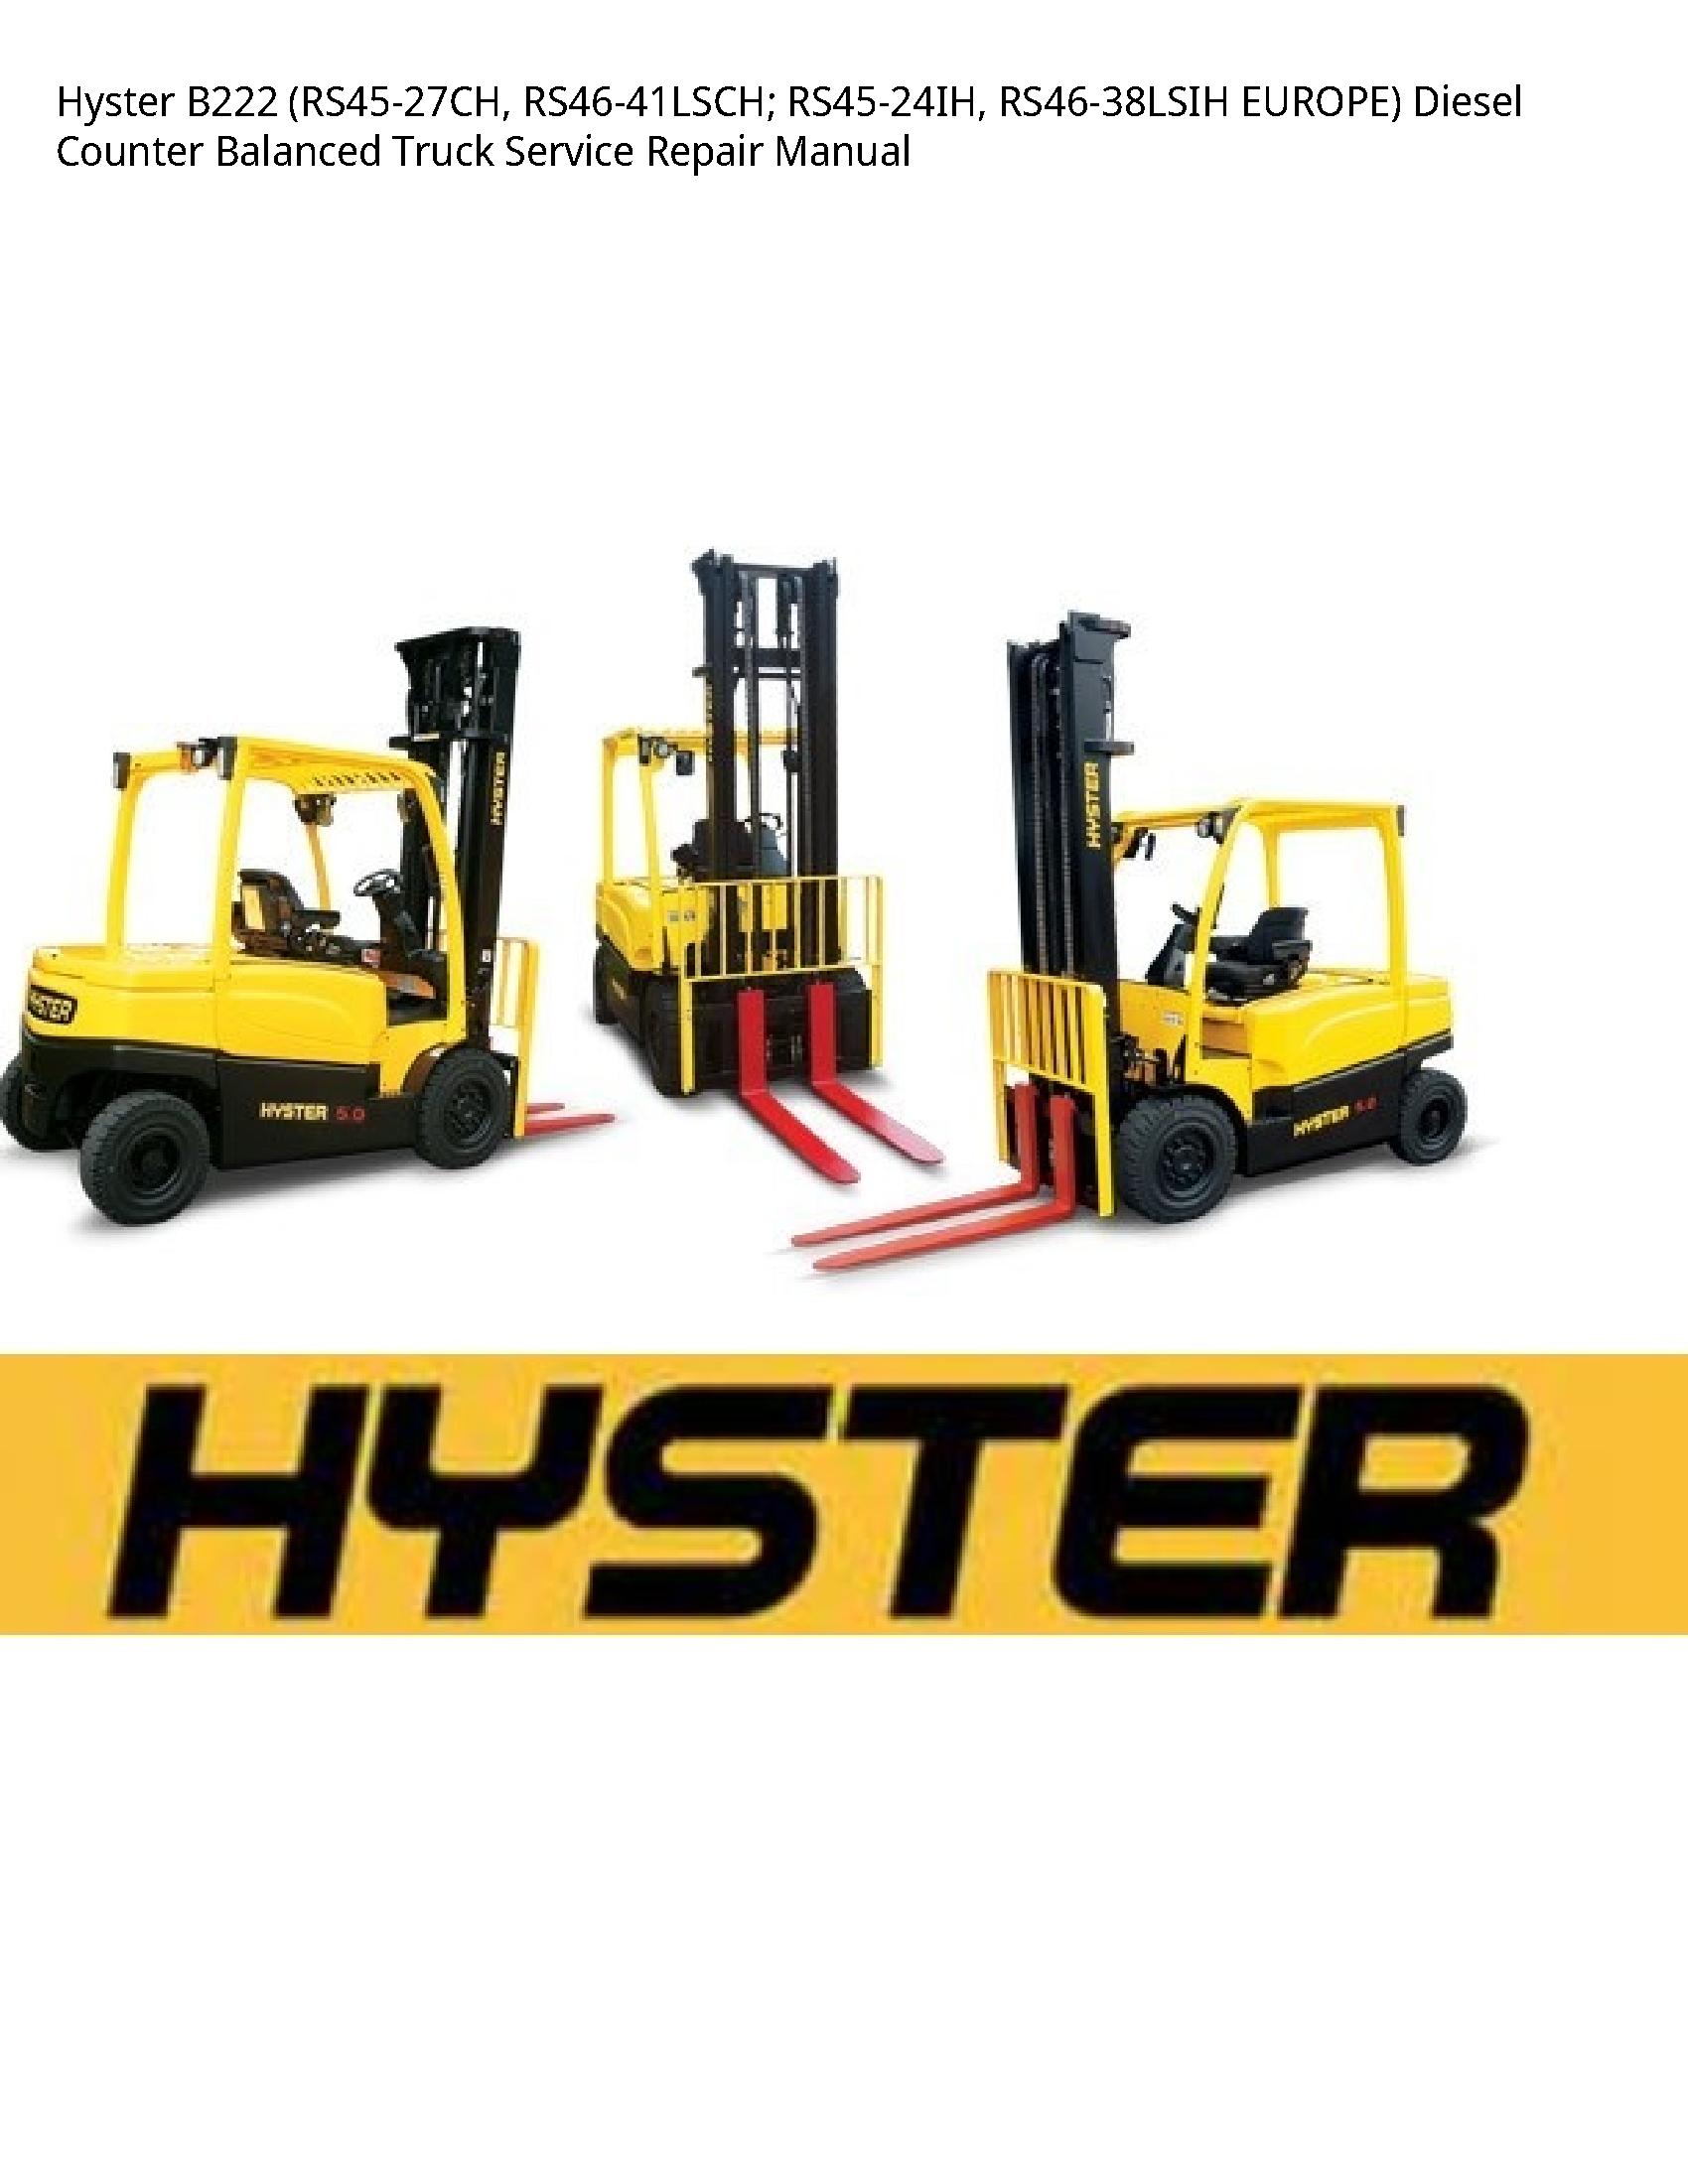 Hyster B222 EUROPE) Diesel Counter Balanced Truck manual